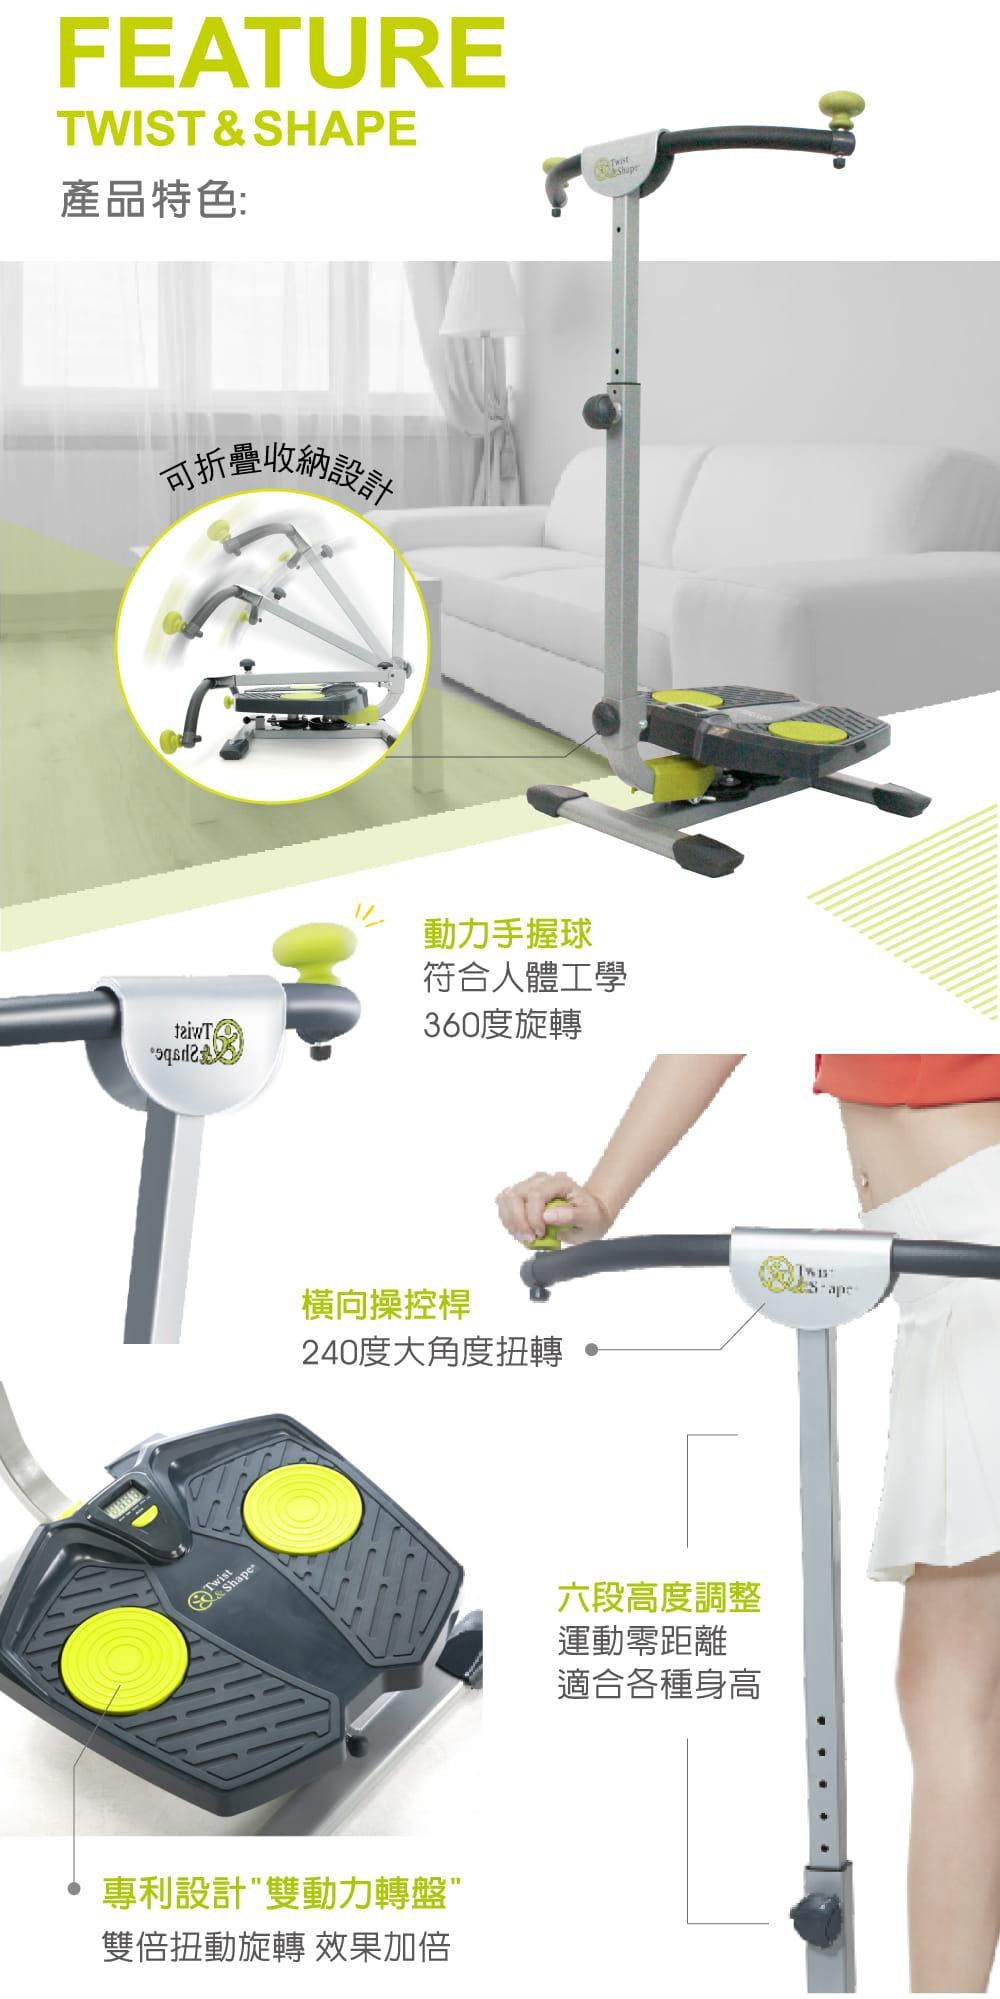 Twist&Shape曲線搖擺健腹機 折疊版 保固一年  贈綠色有氧瑜珈墊 16